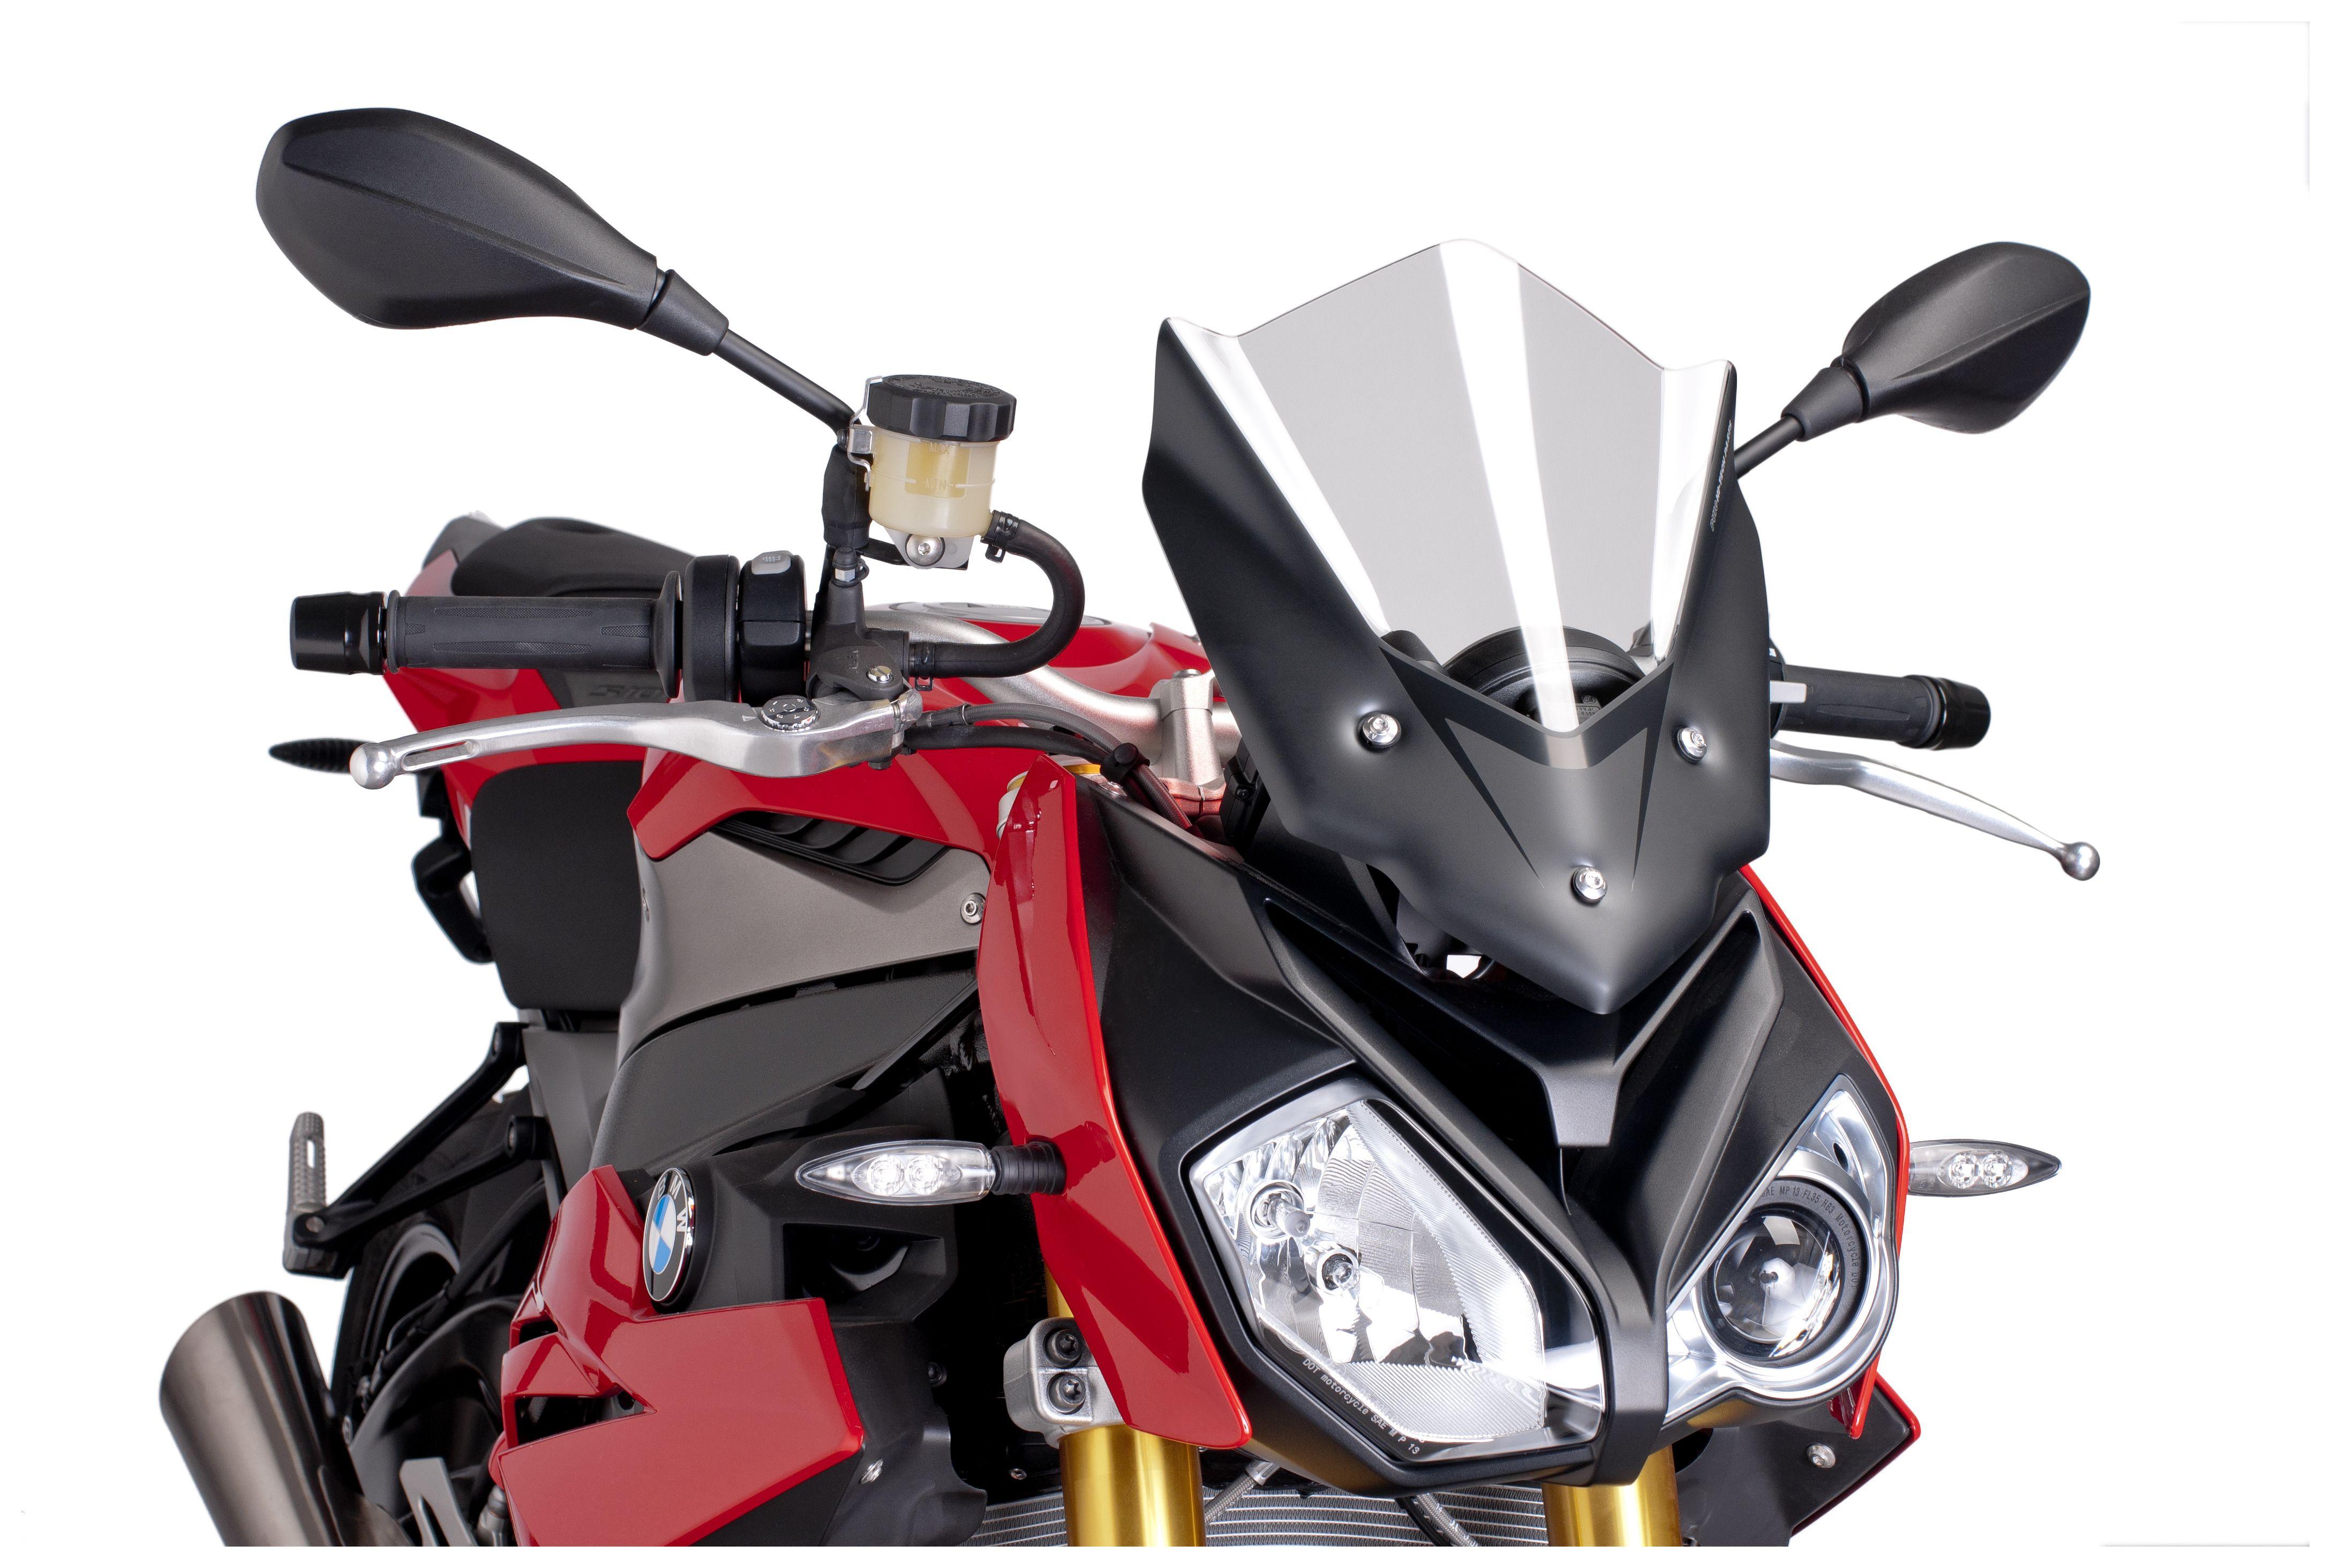 Cupula Parabrisas Puig Suzuki GSX-S1000 2015- Naked New